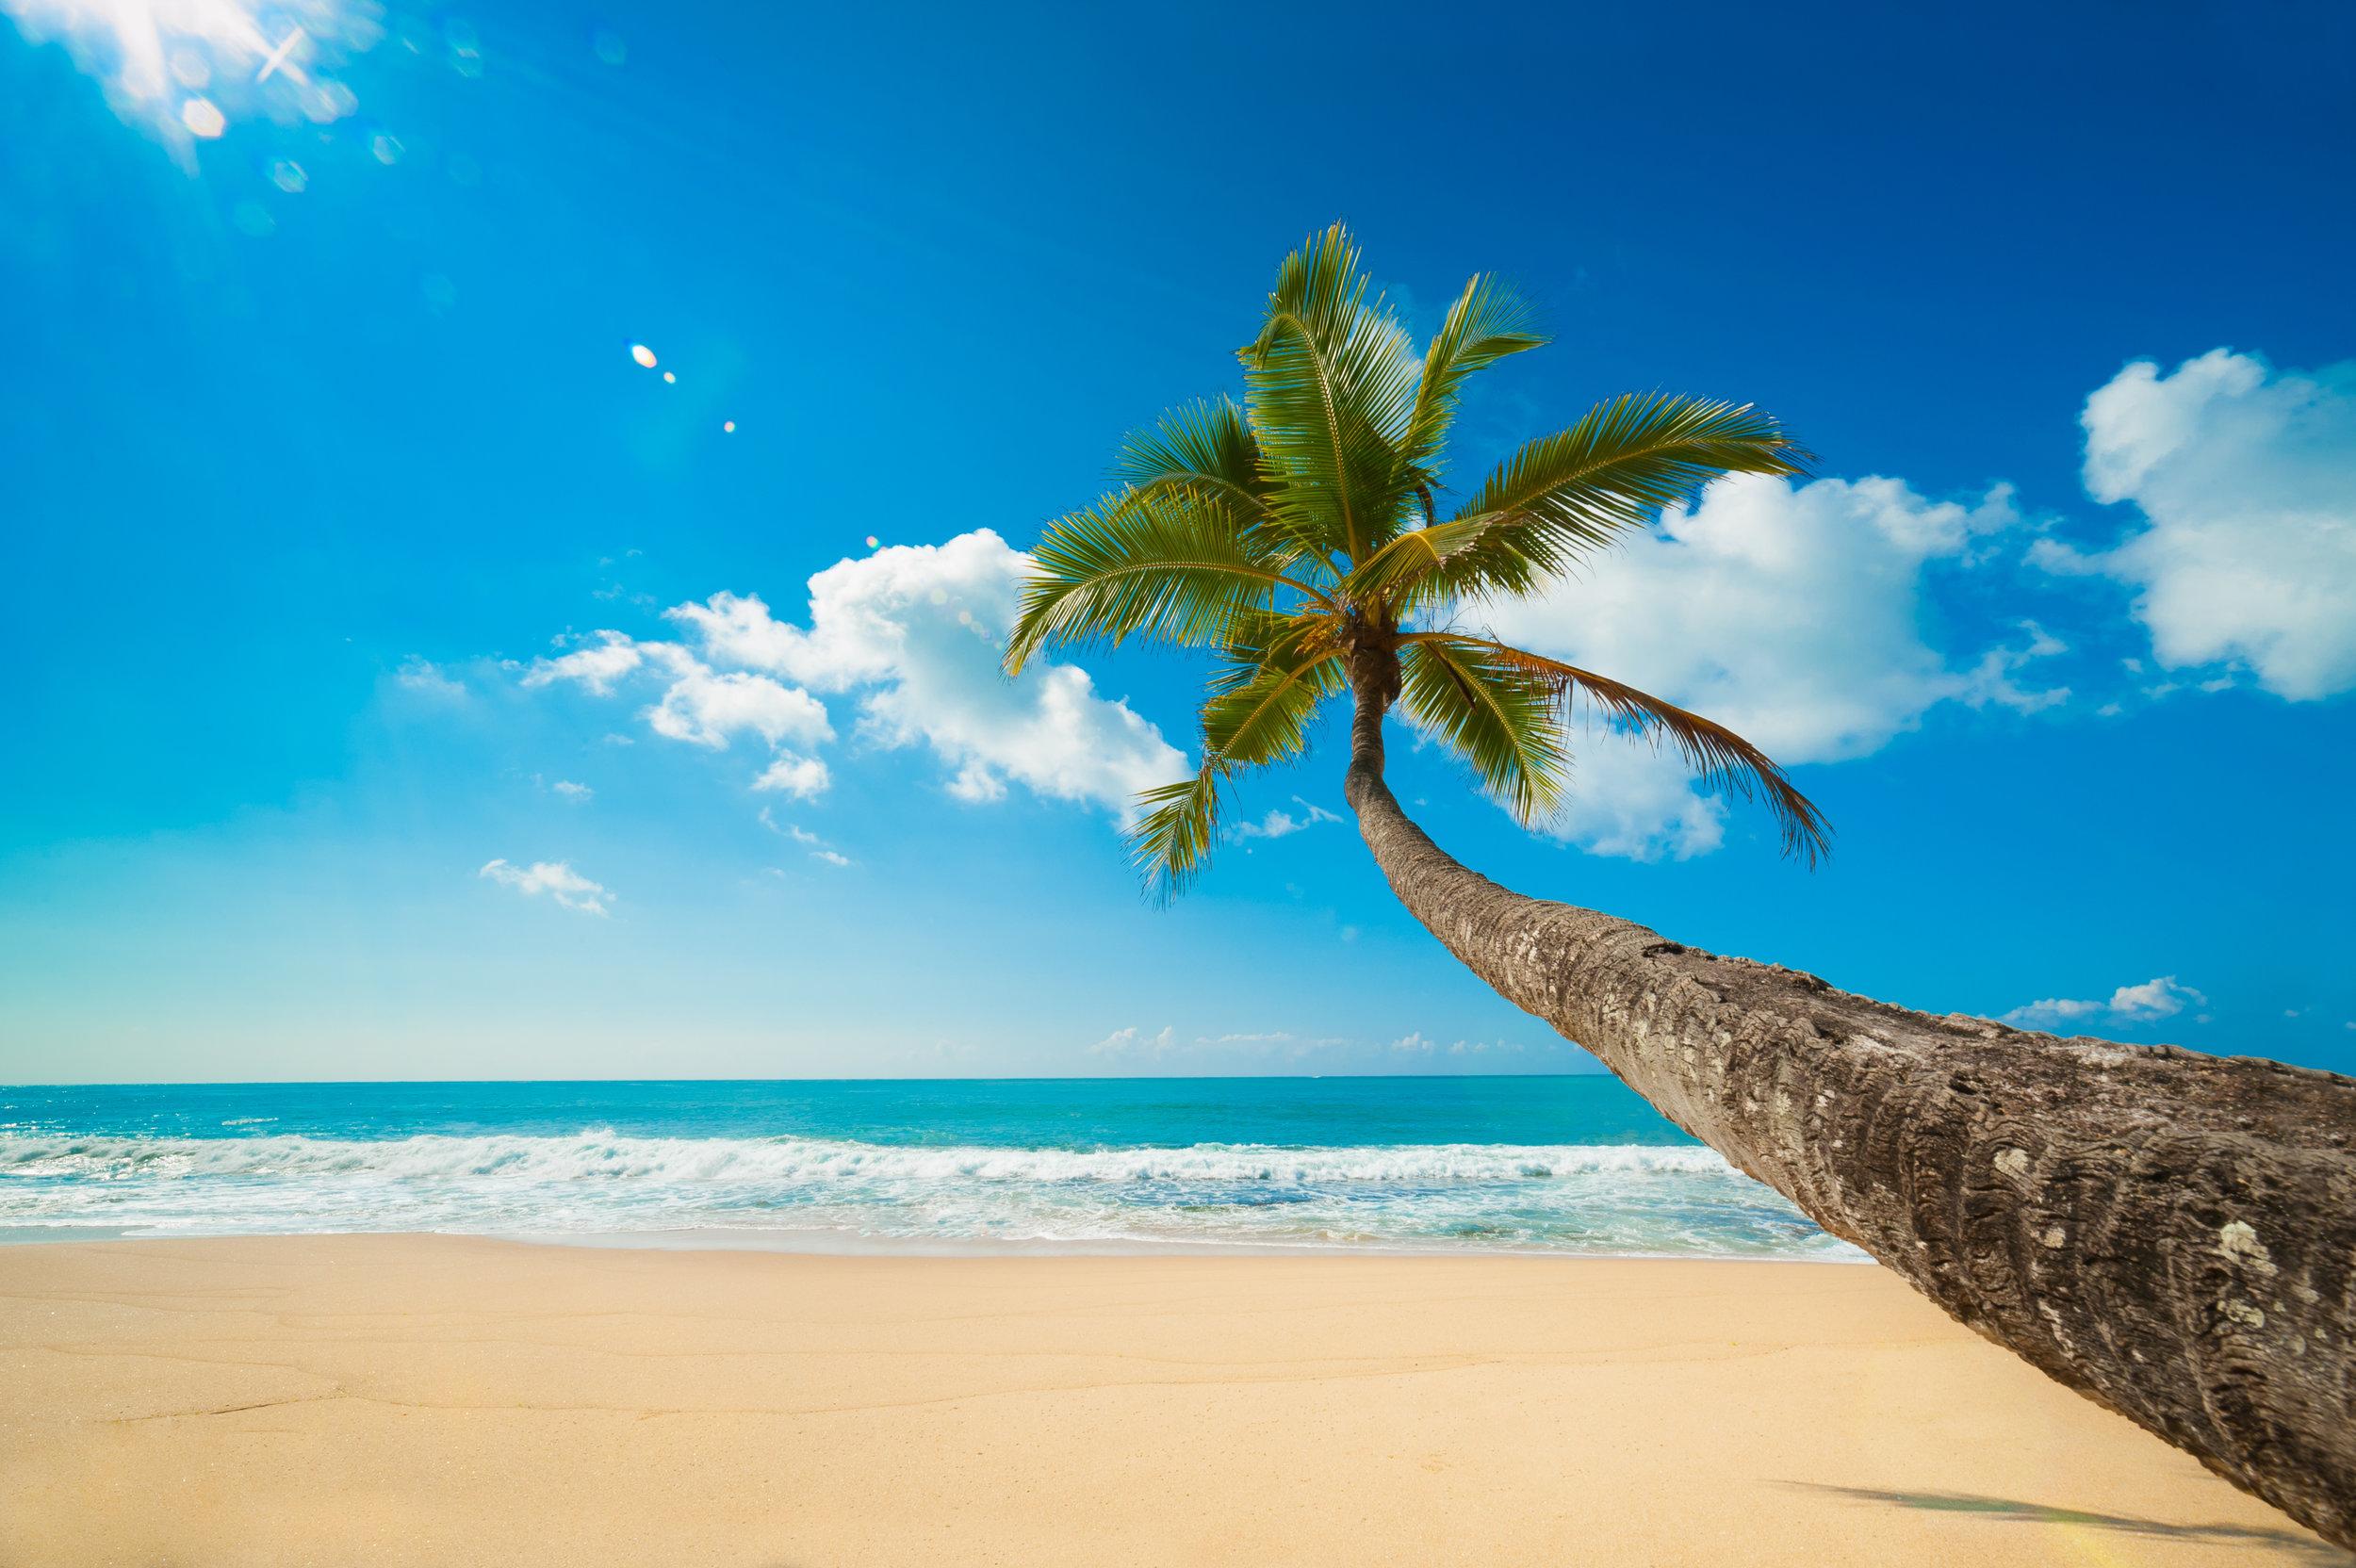 invite-to-paradise-sri-lanka-and-maldives-specialists-tour-operator-travel-agent-holidays-honeymoons-beach-wildlife-safari-culture.jpg